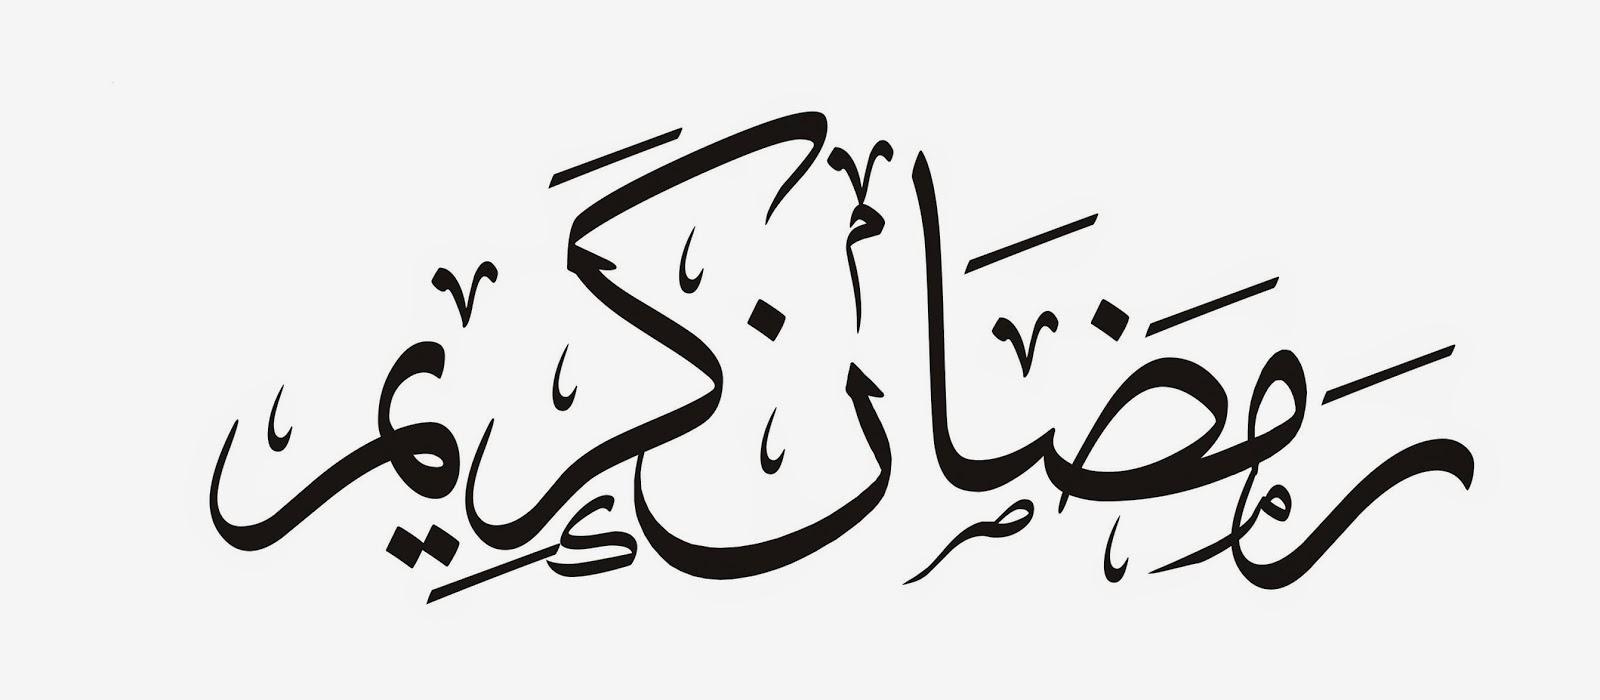 Arabic calligraphy clip art image royalty free stock Ramdan kareem clipart - ClipartFox image royalty free stock